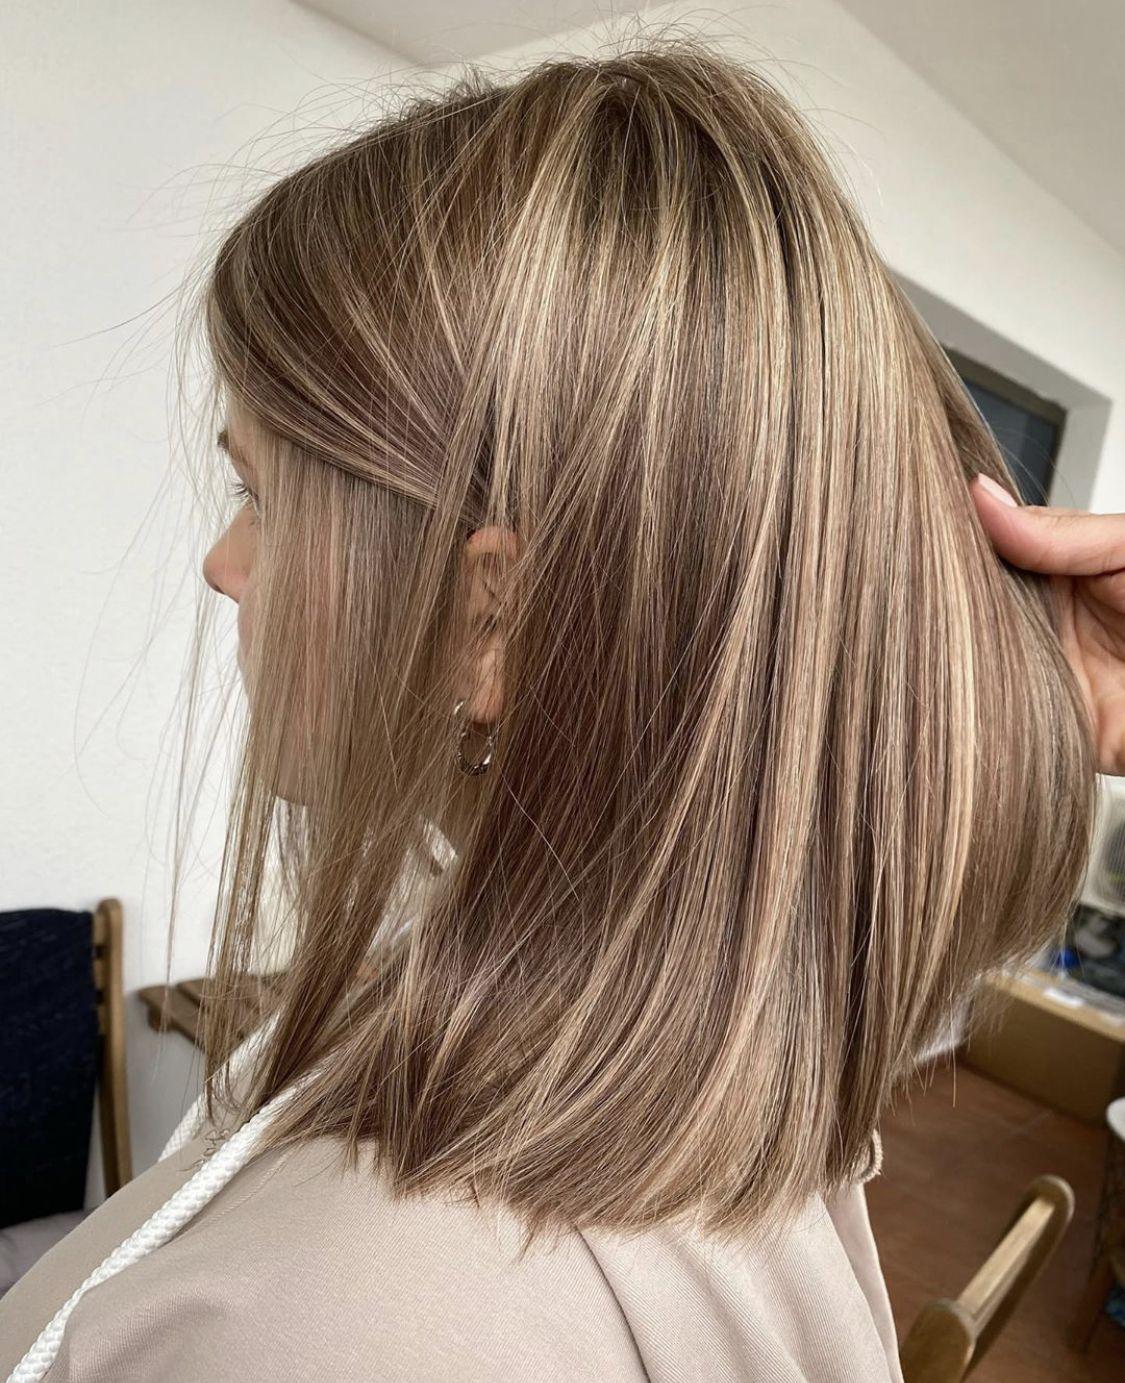 Pin By Lotta On Hair In 2020 Hair Styles Blonde Hair Looks Long Hair Styles